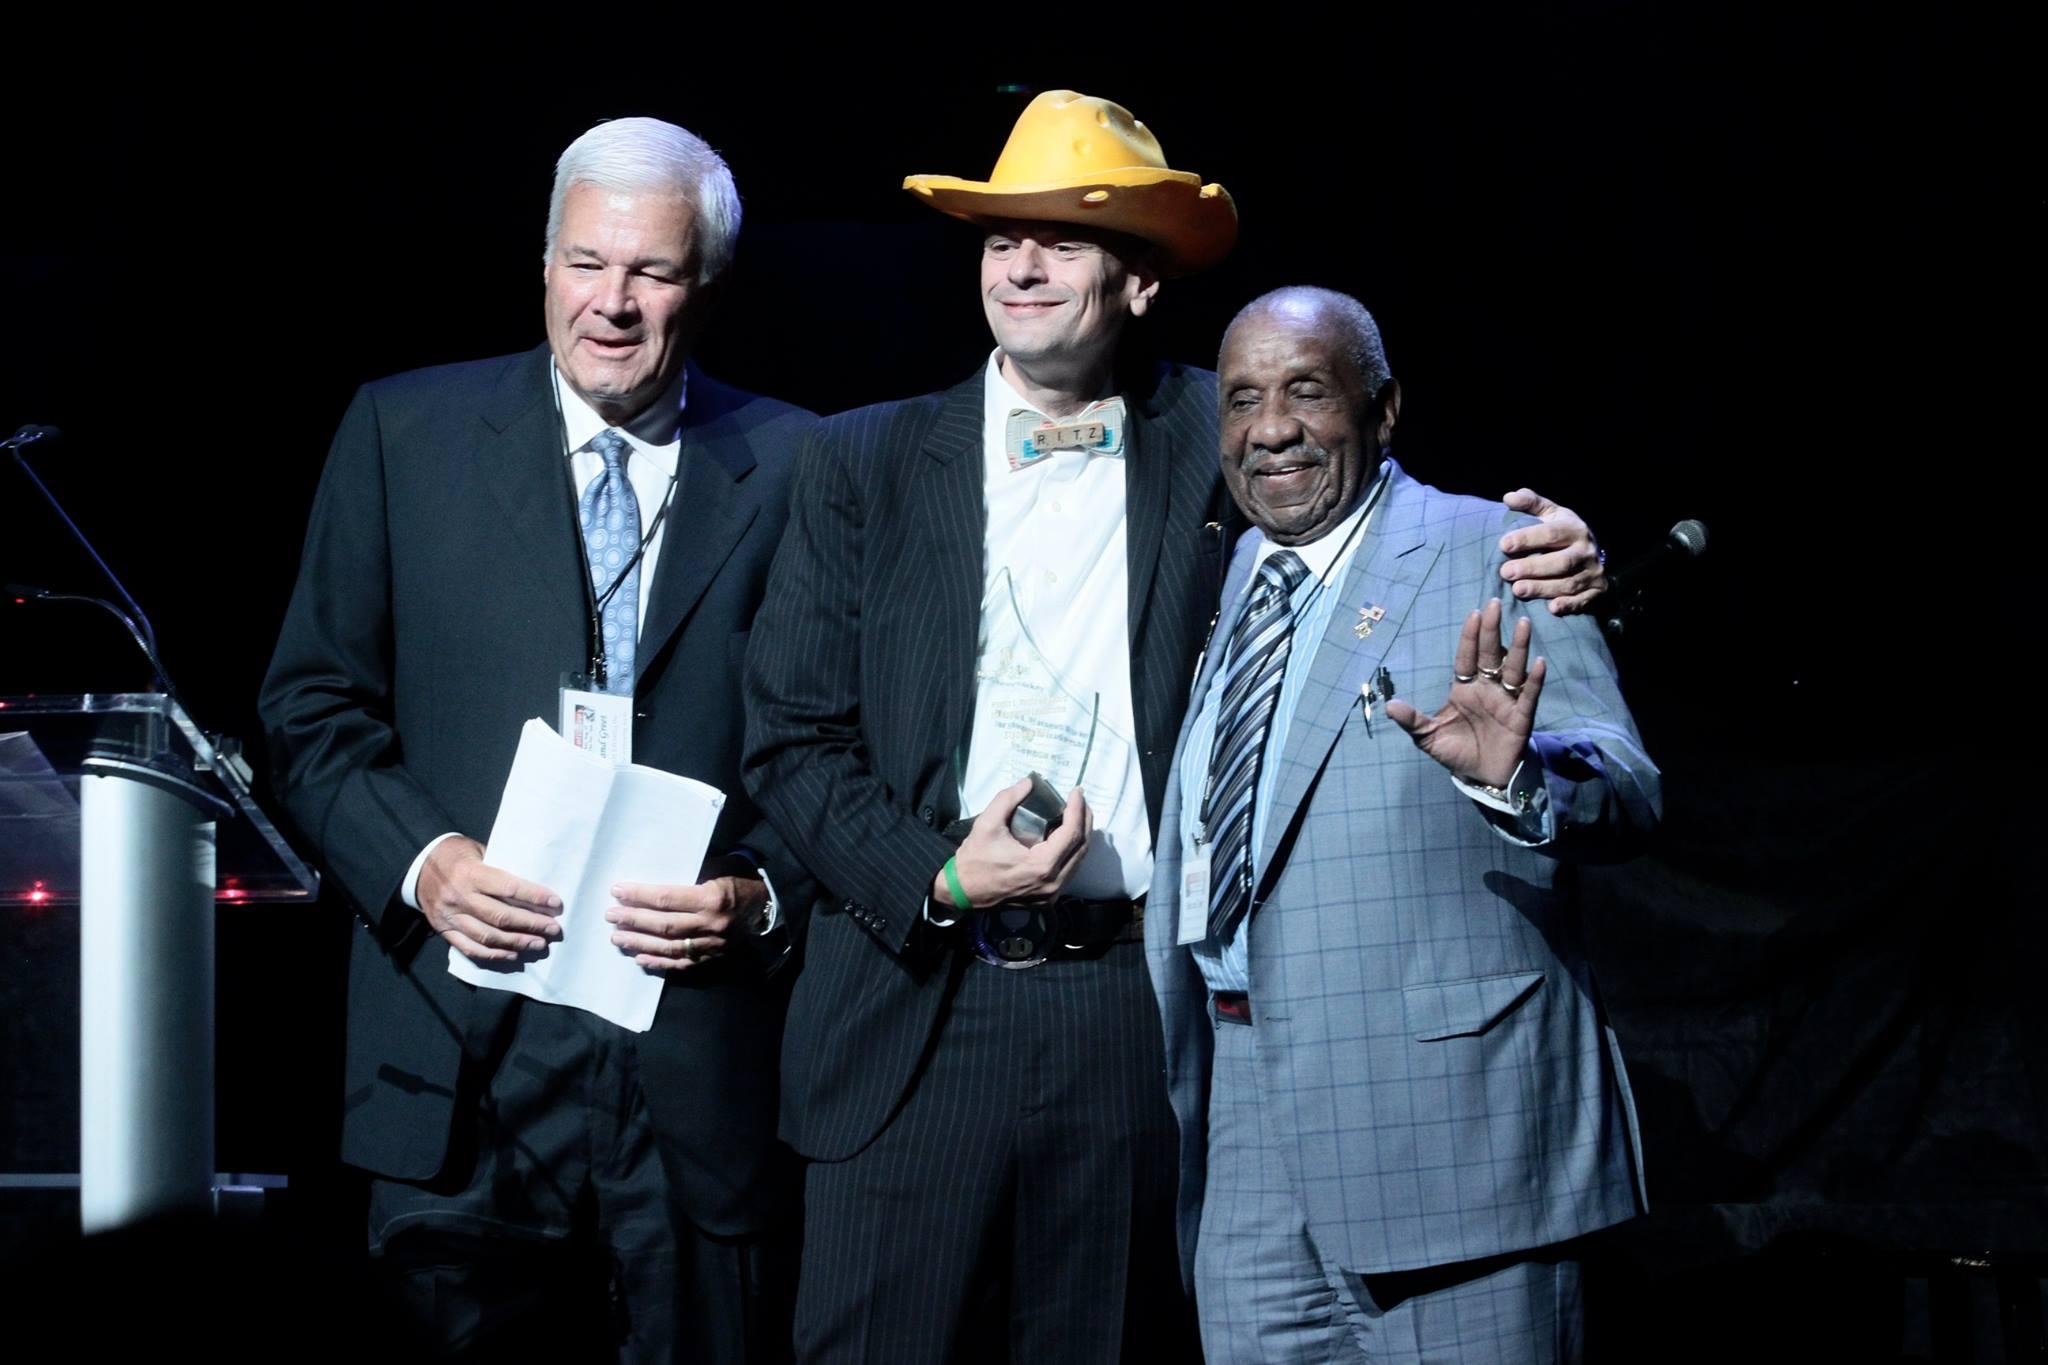 Martin L. Mathews Award for Nonprofit Leadership